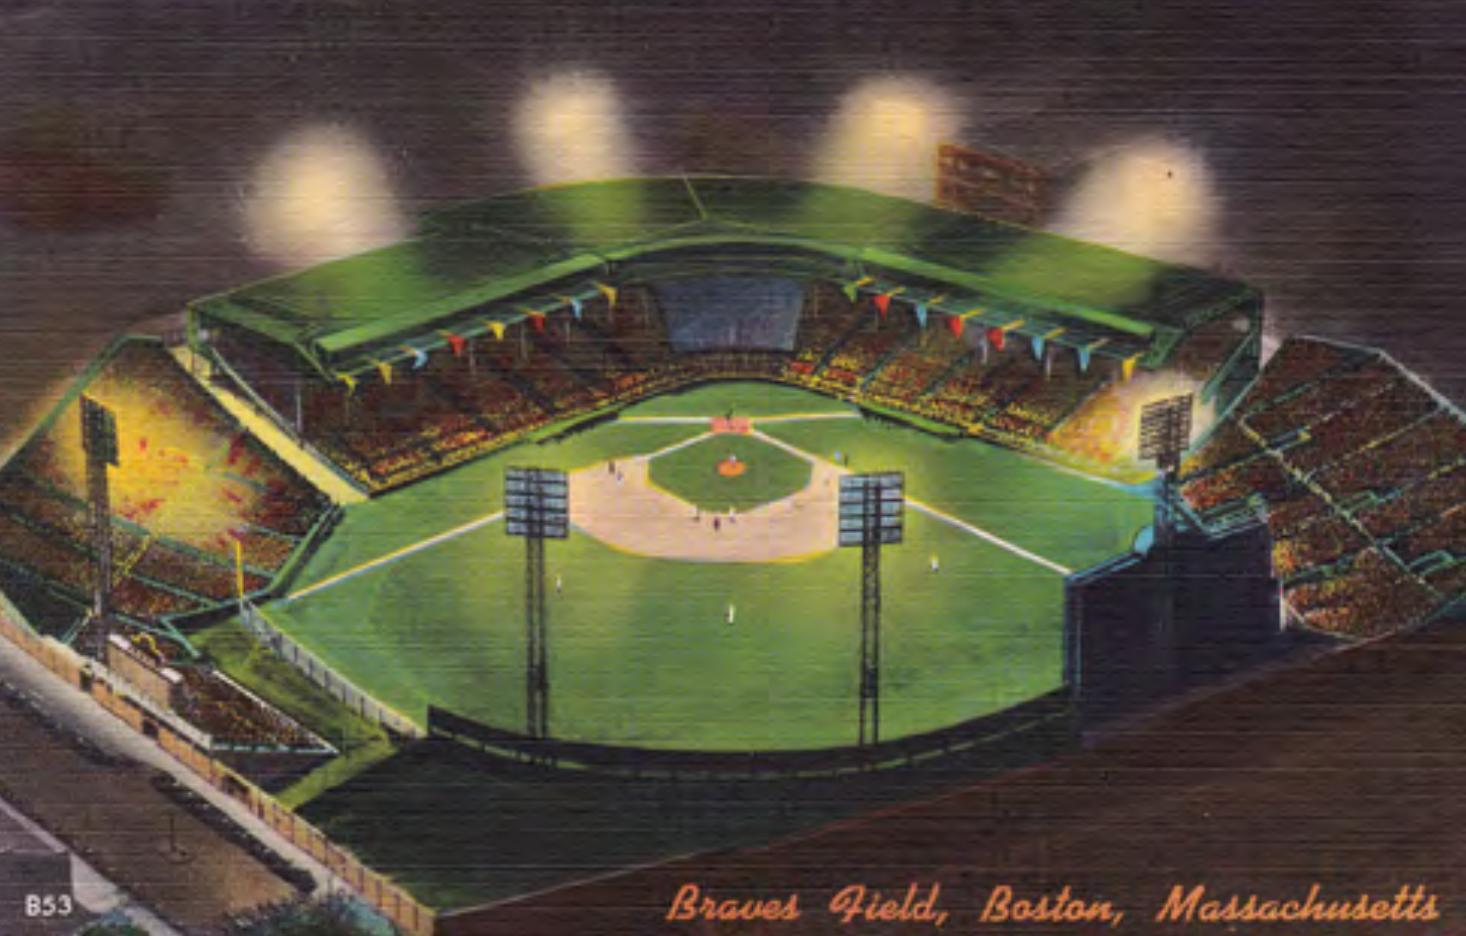 Braves Field at night